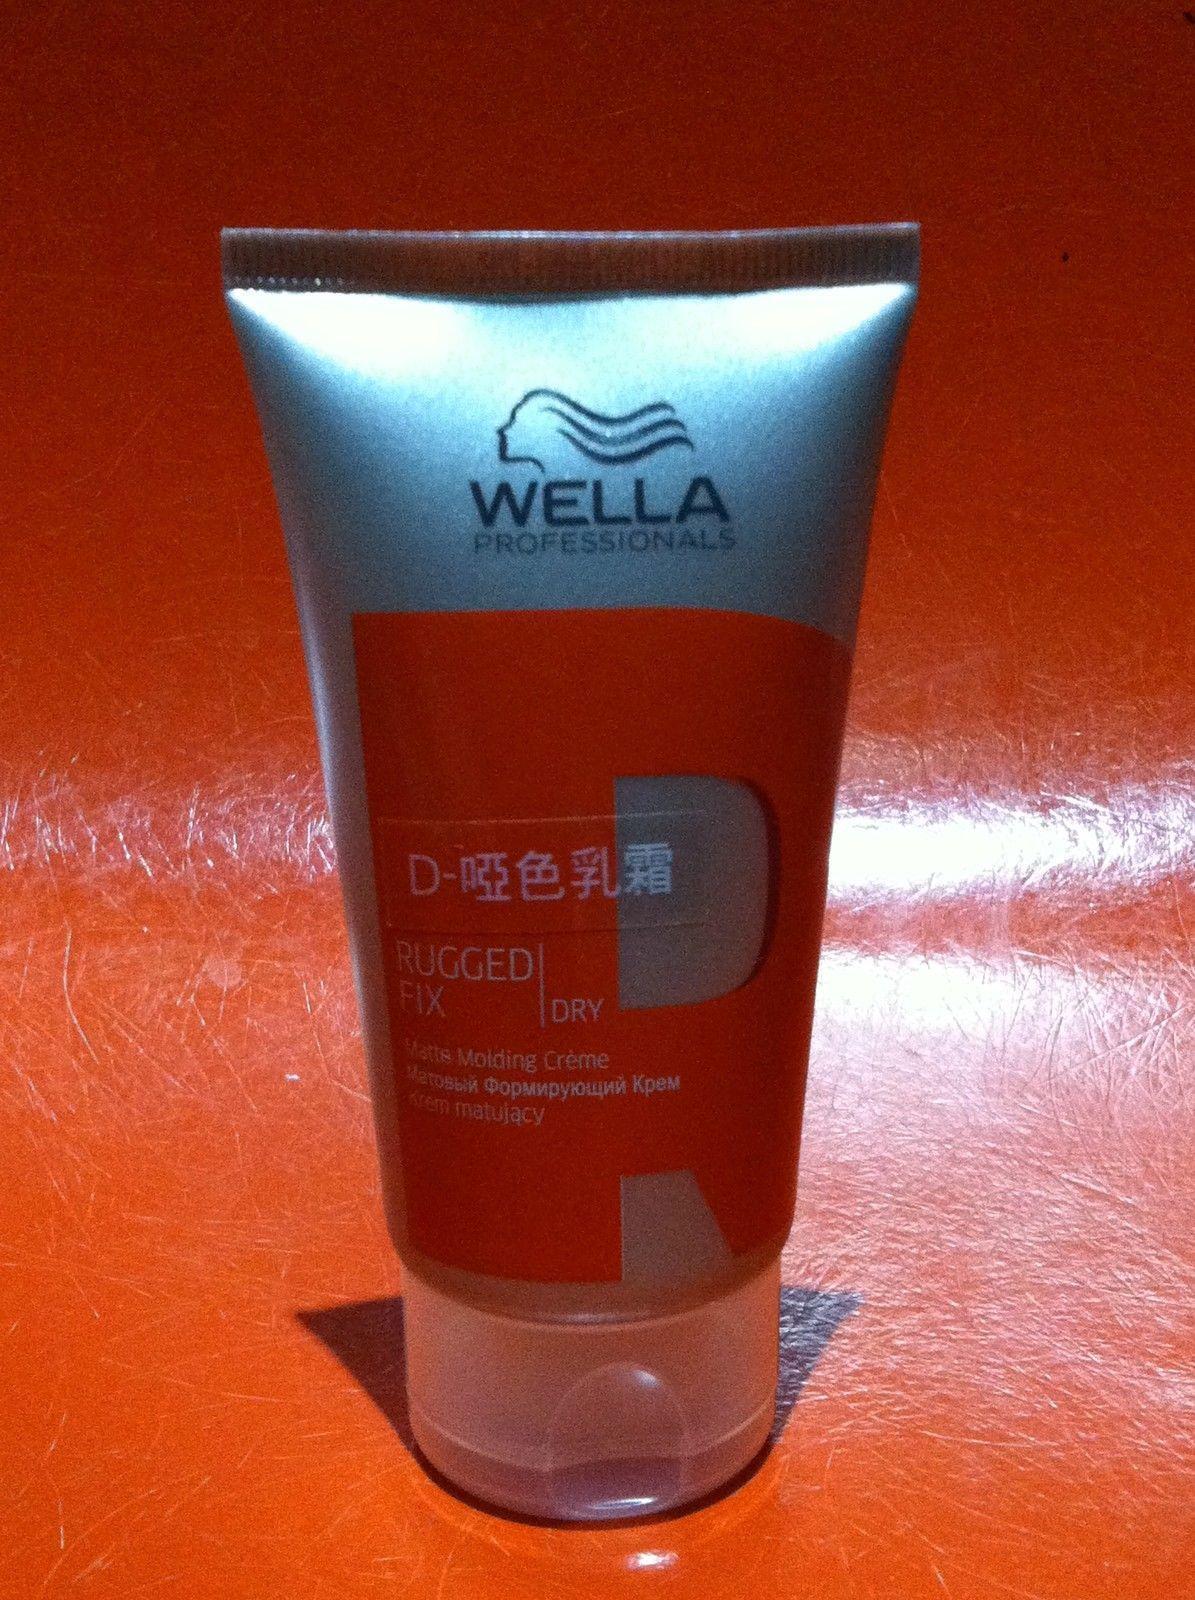 Wella Professionals High Hair Rugged Fix Dry Matte Molding